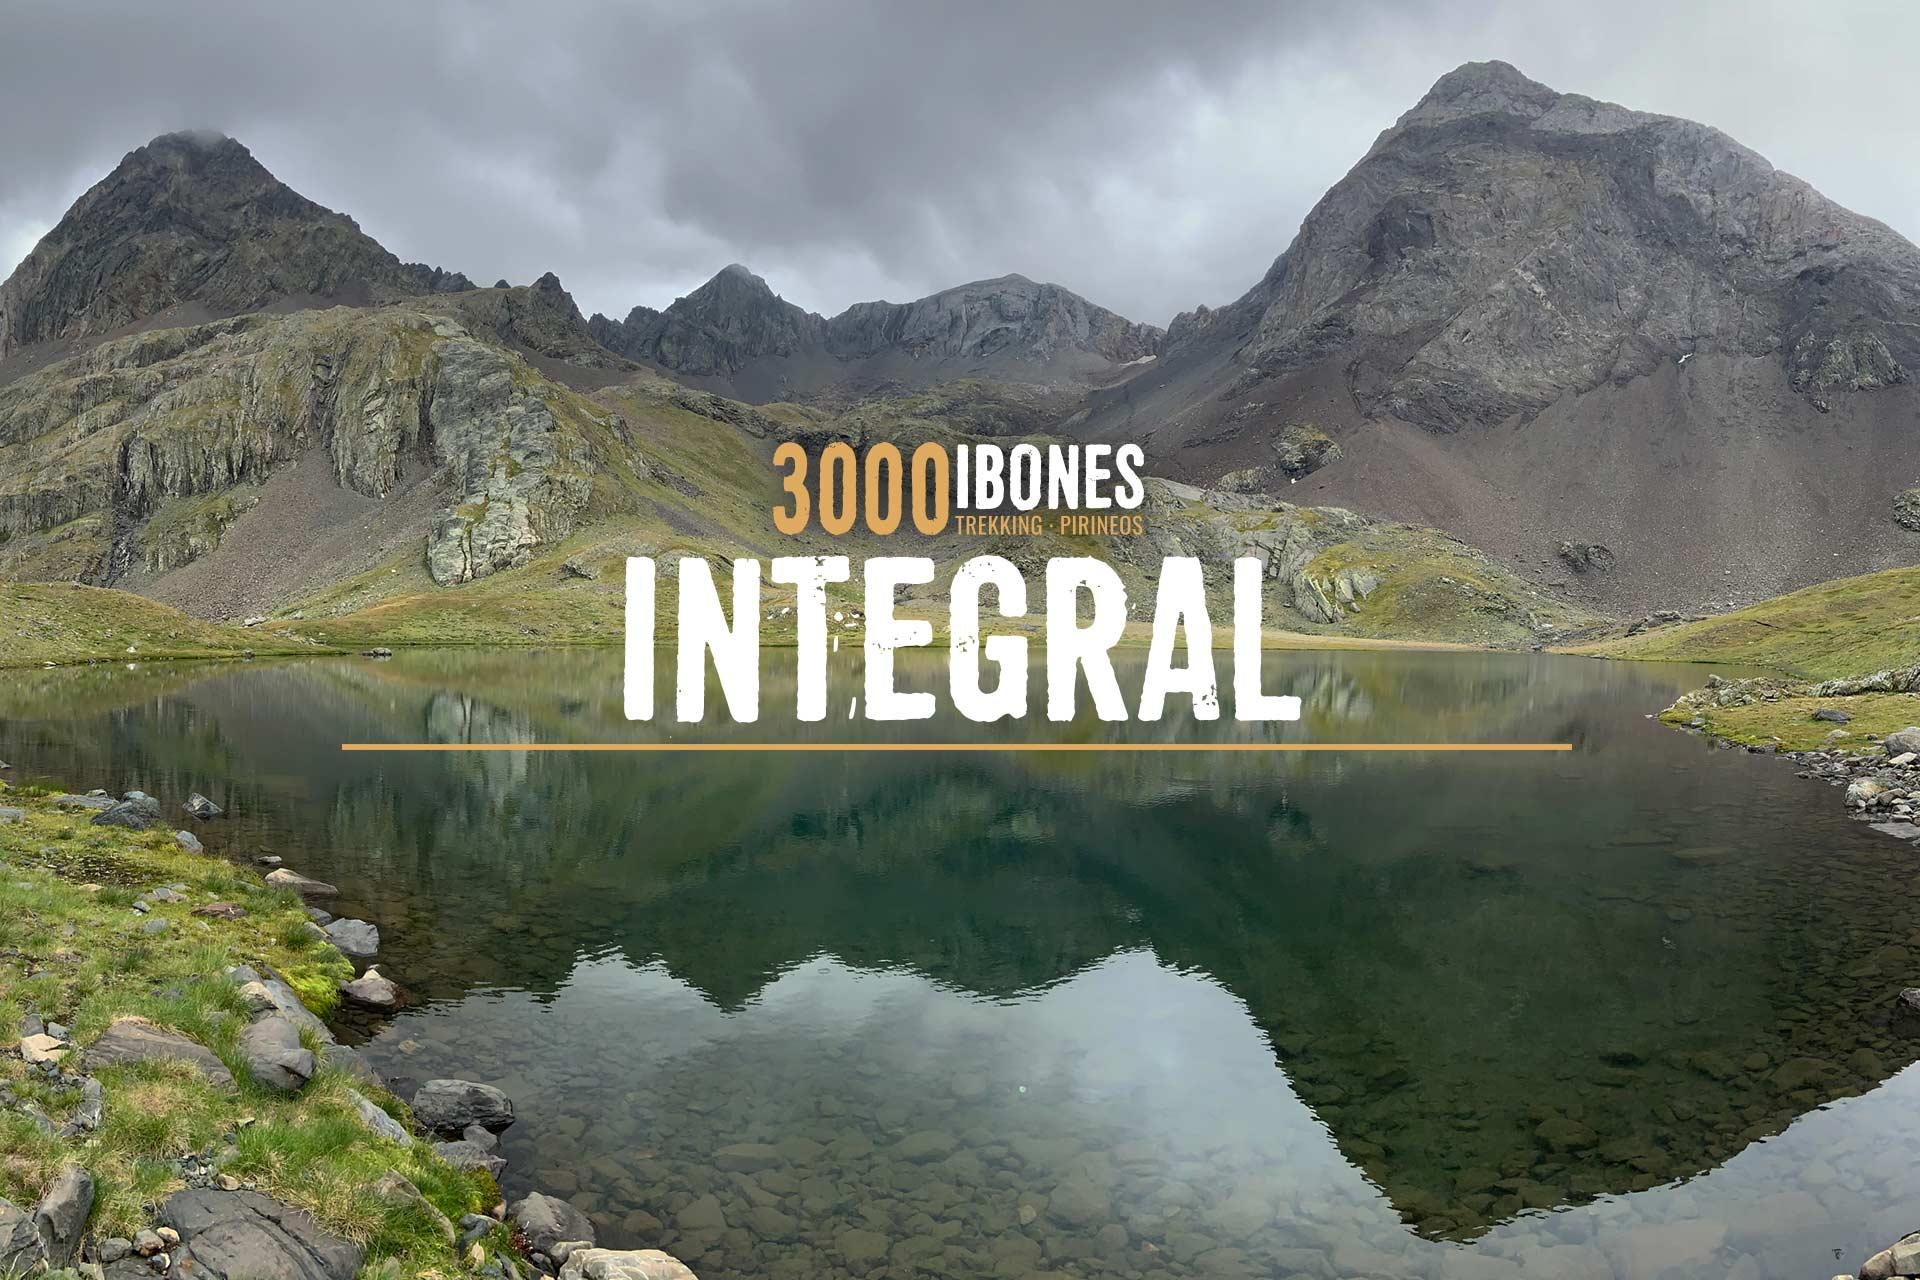 3000IBONES INTEGRAL - TREKKING POR ETAPAS PIRINEOS